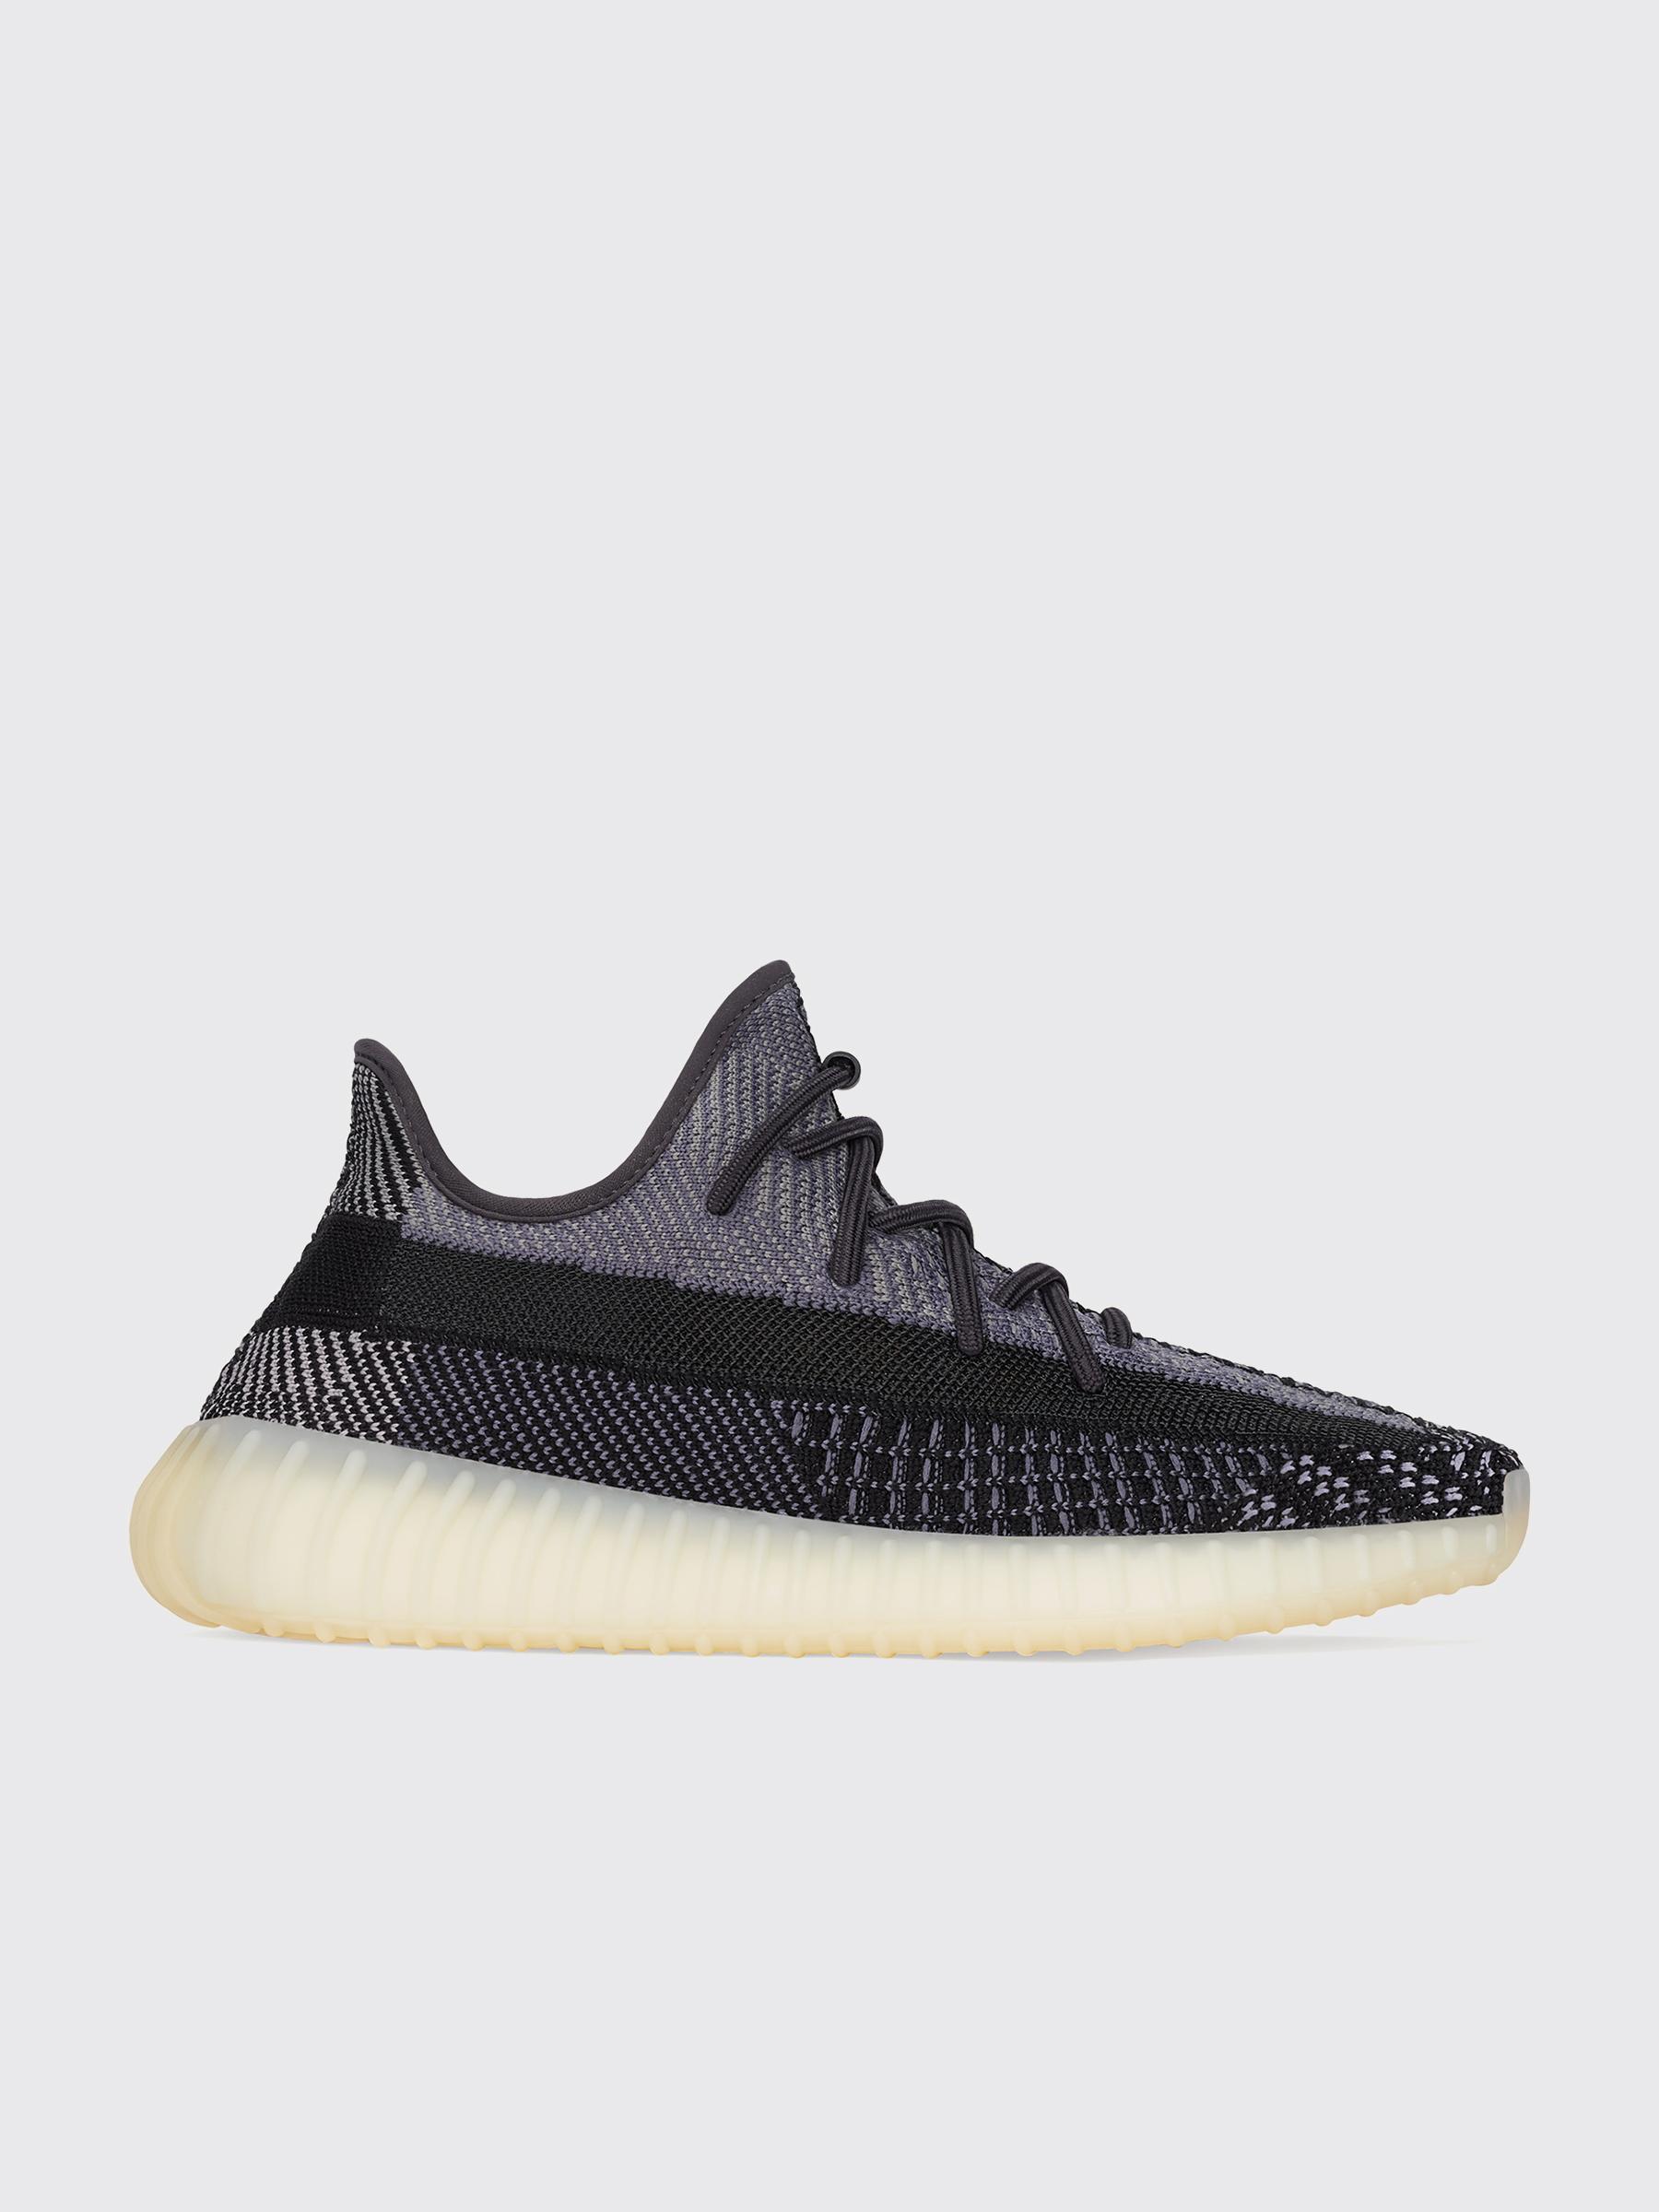 adidas boost 350 yezzy